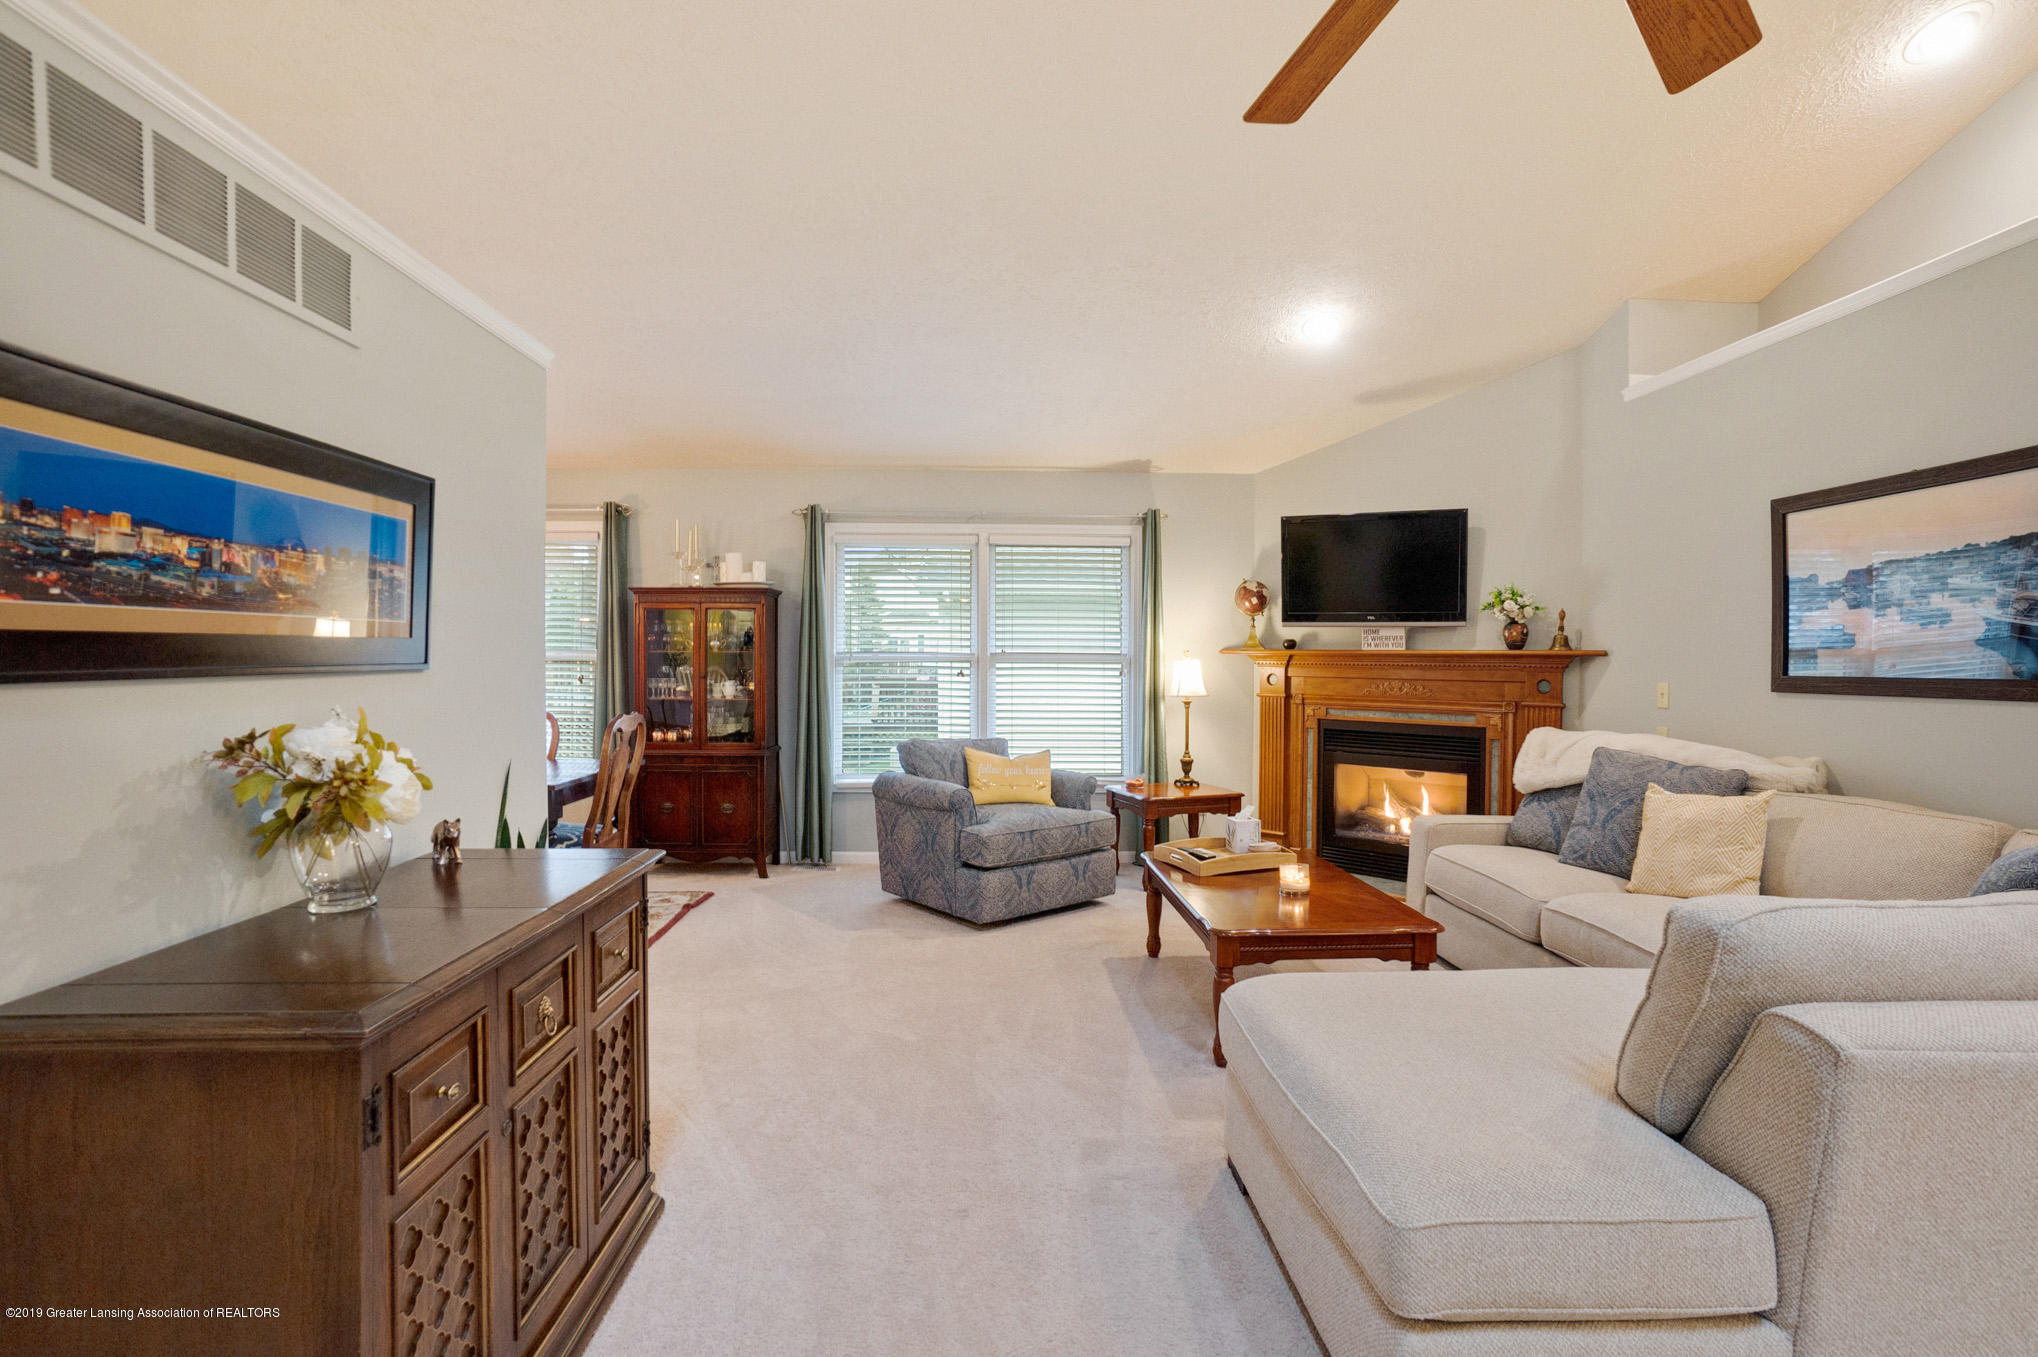 2540 Cunningham Dr - Living Room - 5